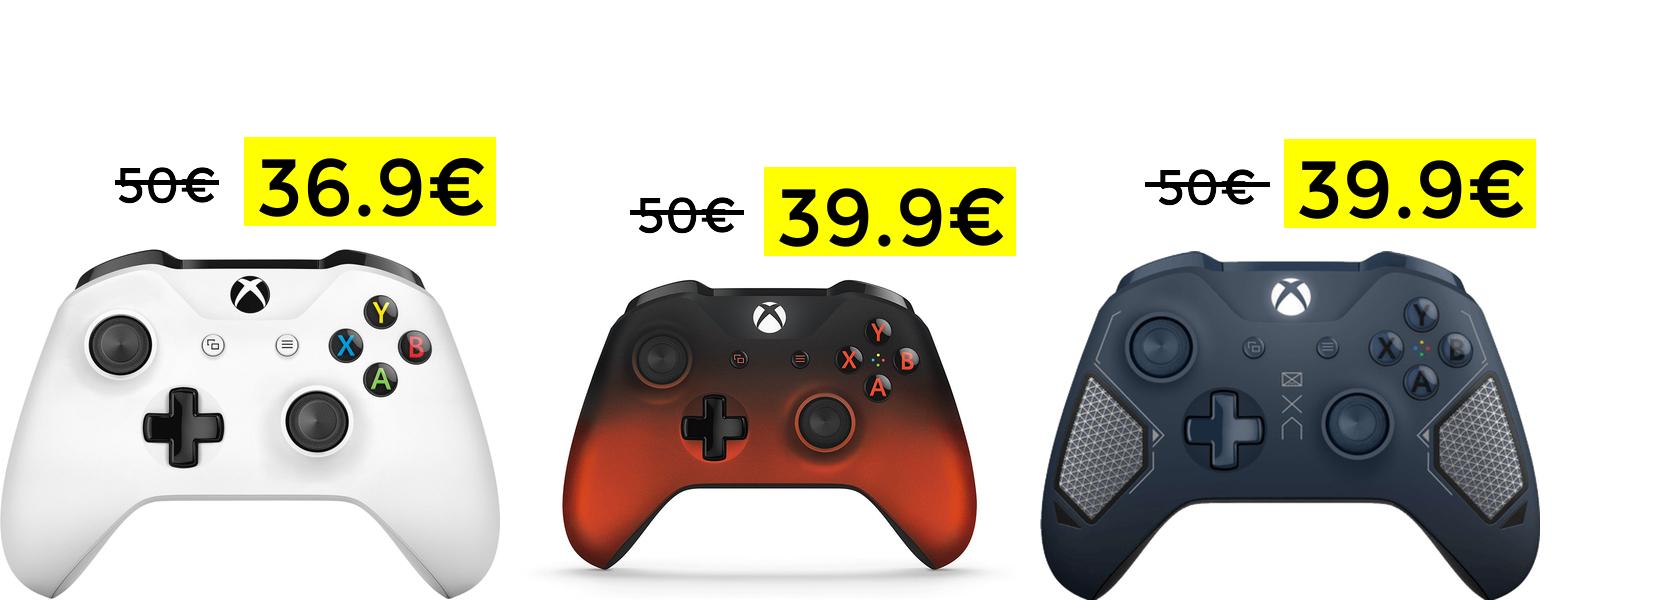 Mandos Xbox One desde solo 36.9€